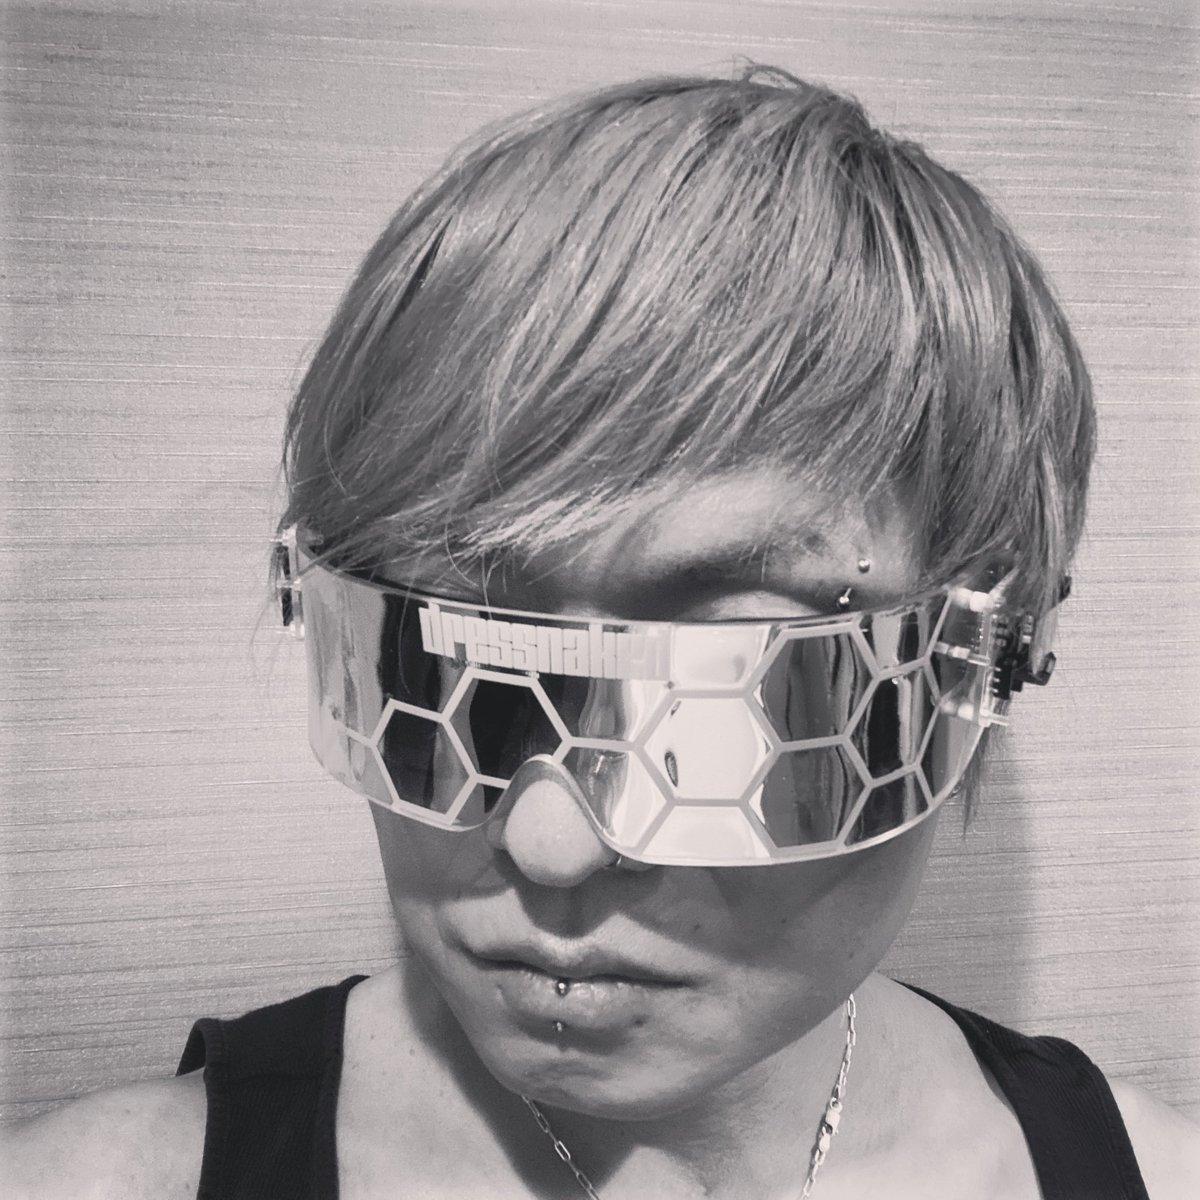 mirror type prototype  まだまだ商品にはなりませんなあ  #cycer #cyberfashion #cyberpunk #pdc #アーティズムマーケット #fashion https://t.co/ynrZrI7d0n